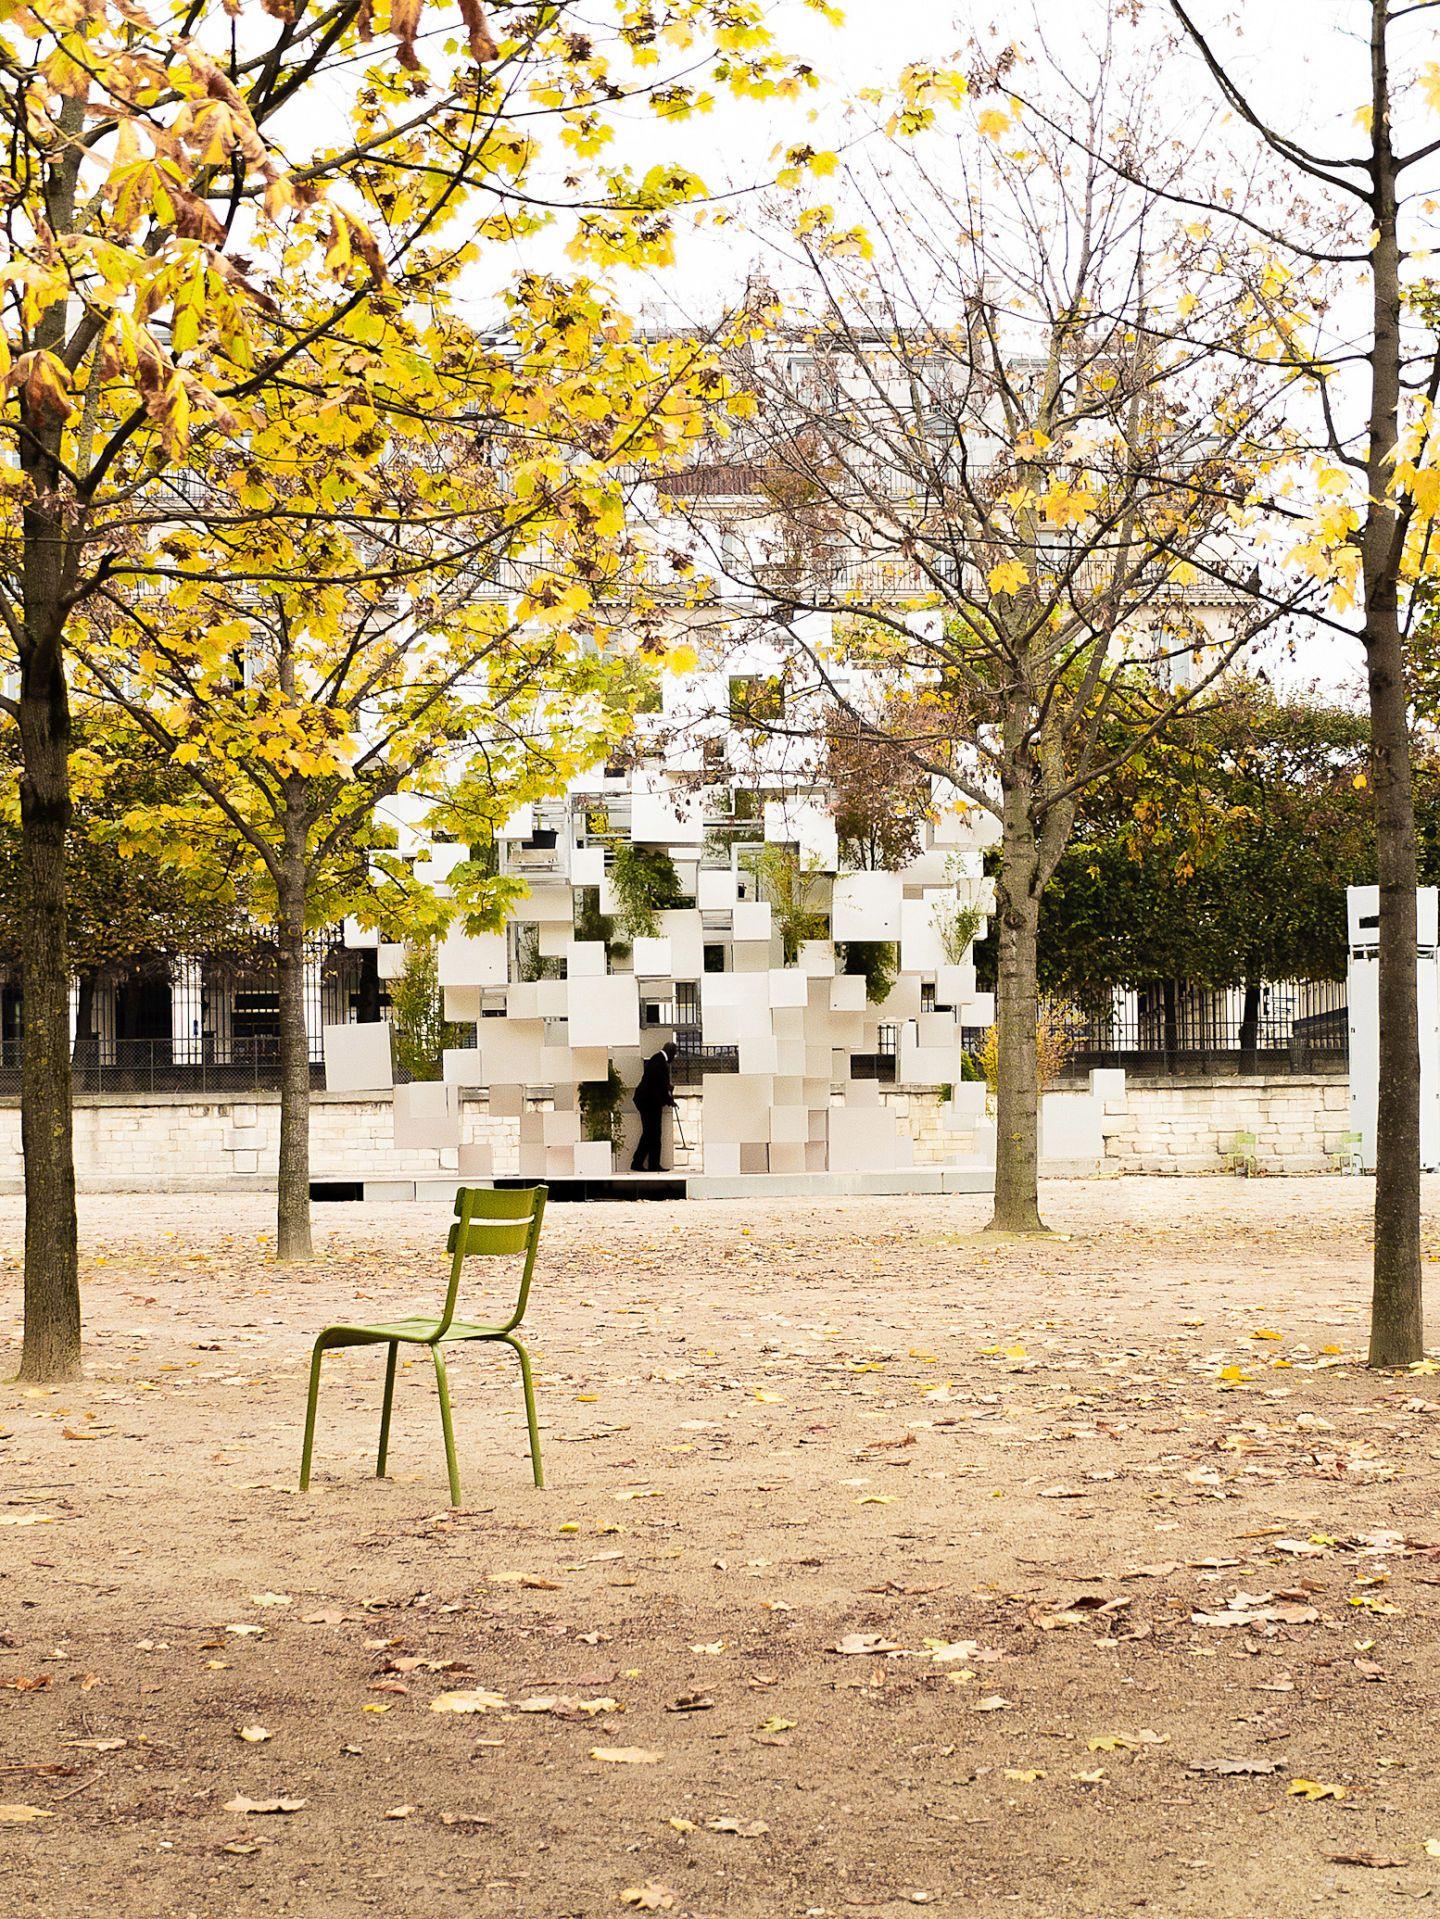 Installation in Paris Jardins des Tuileries